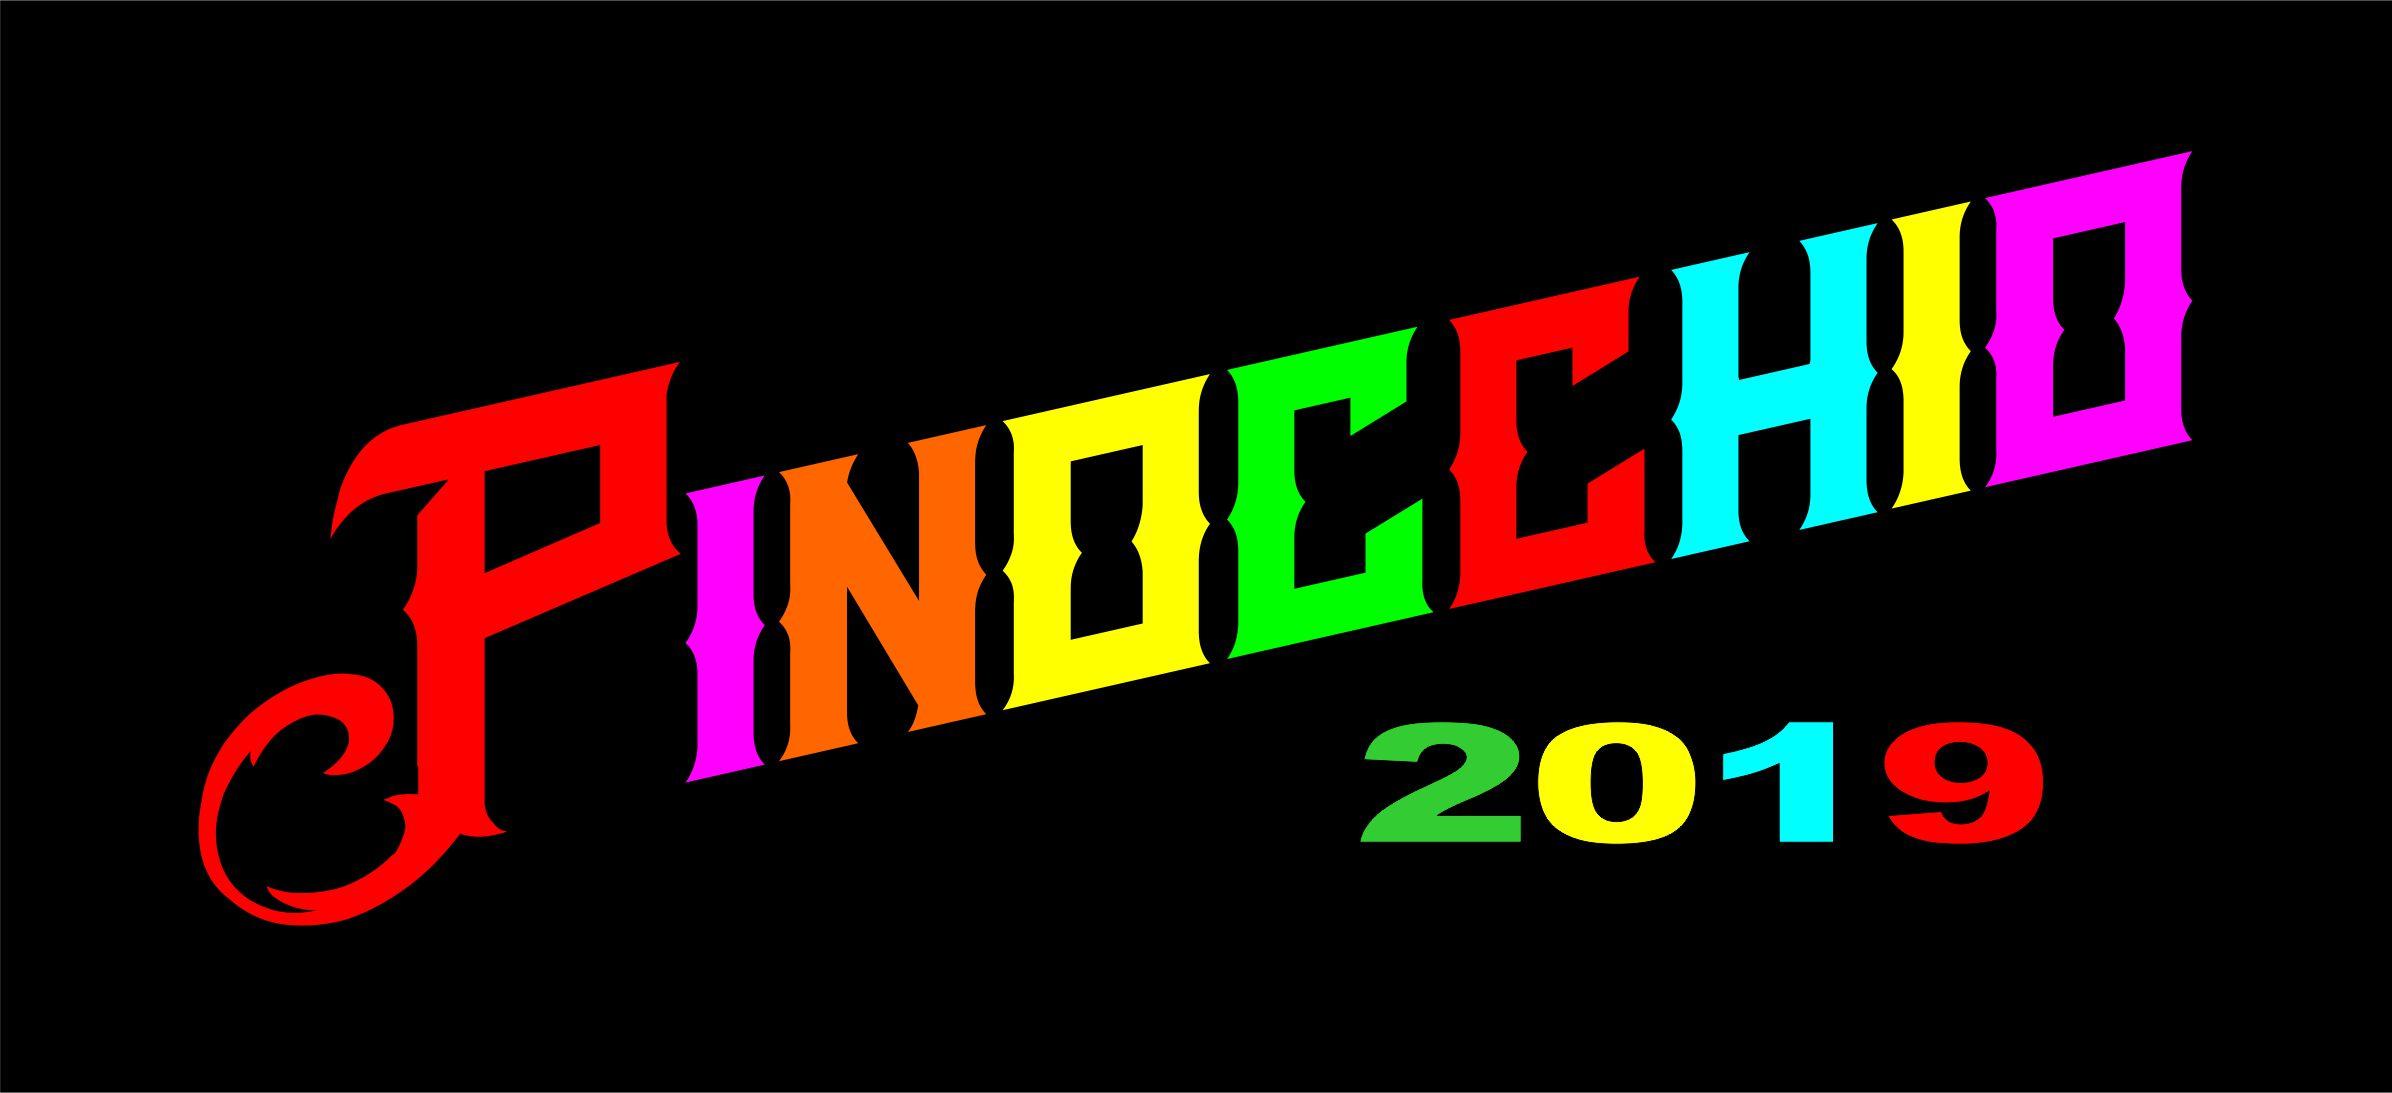 Pinocchio banner image